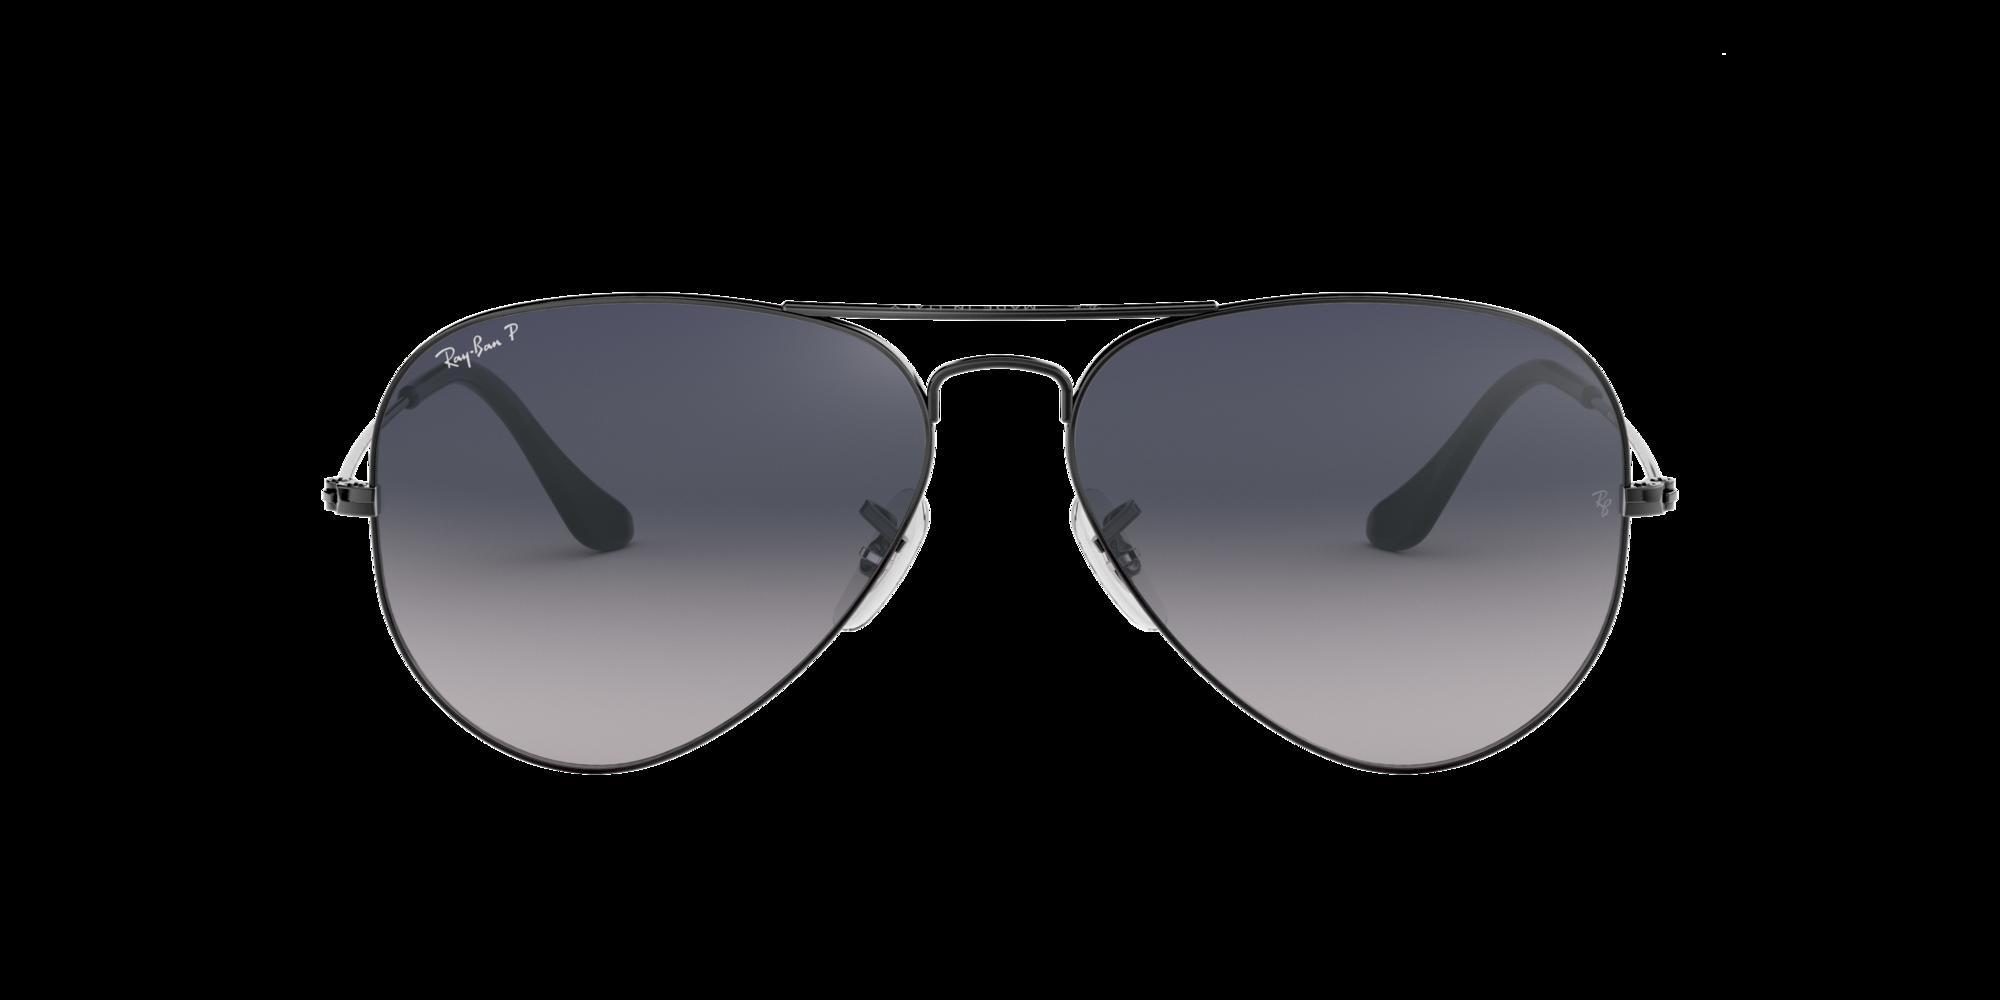 Image for RB3025 55 AVIATOR LARGE METAL from LensCrafters | Glasses, Prescription Glasses Online, Eyewear